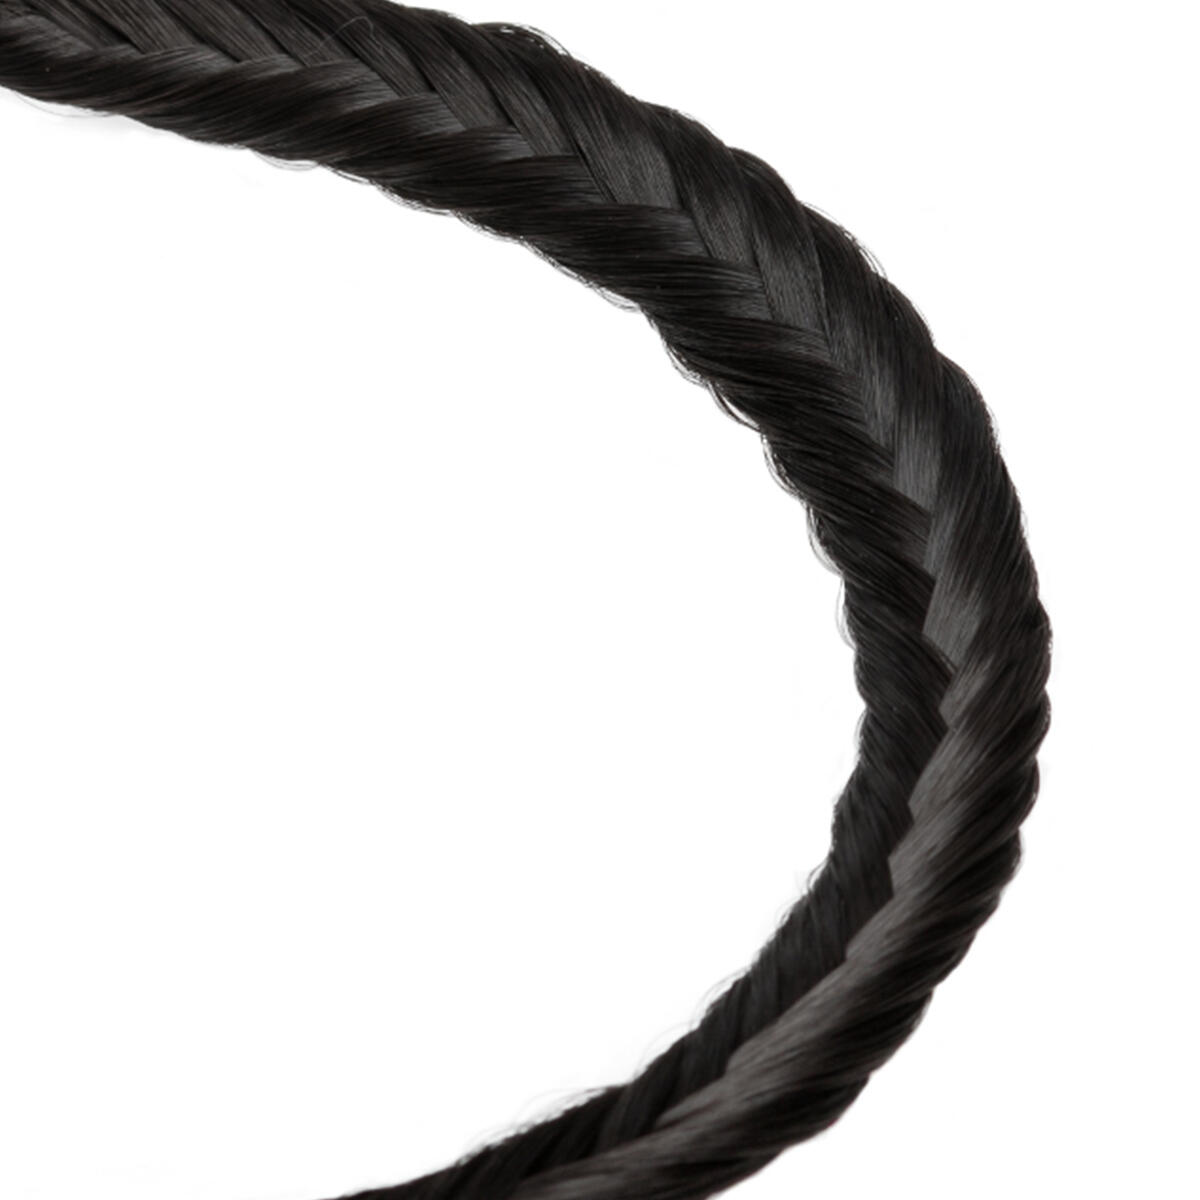 Synthetic Braided Headband 1.2 Black Brown 0 cm